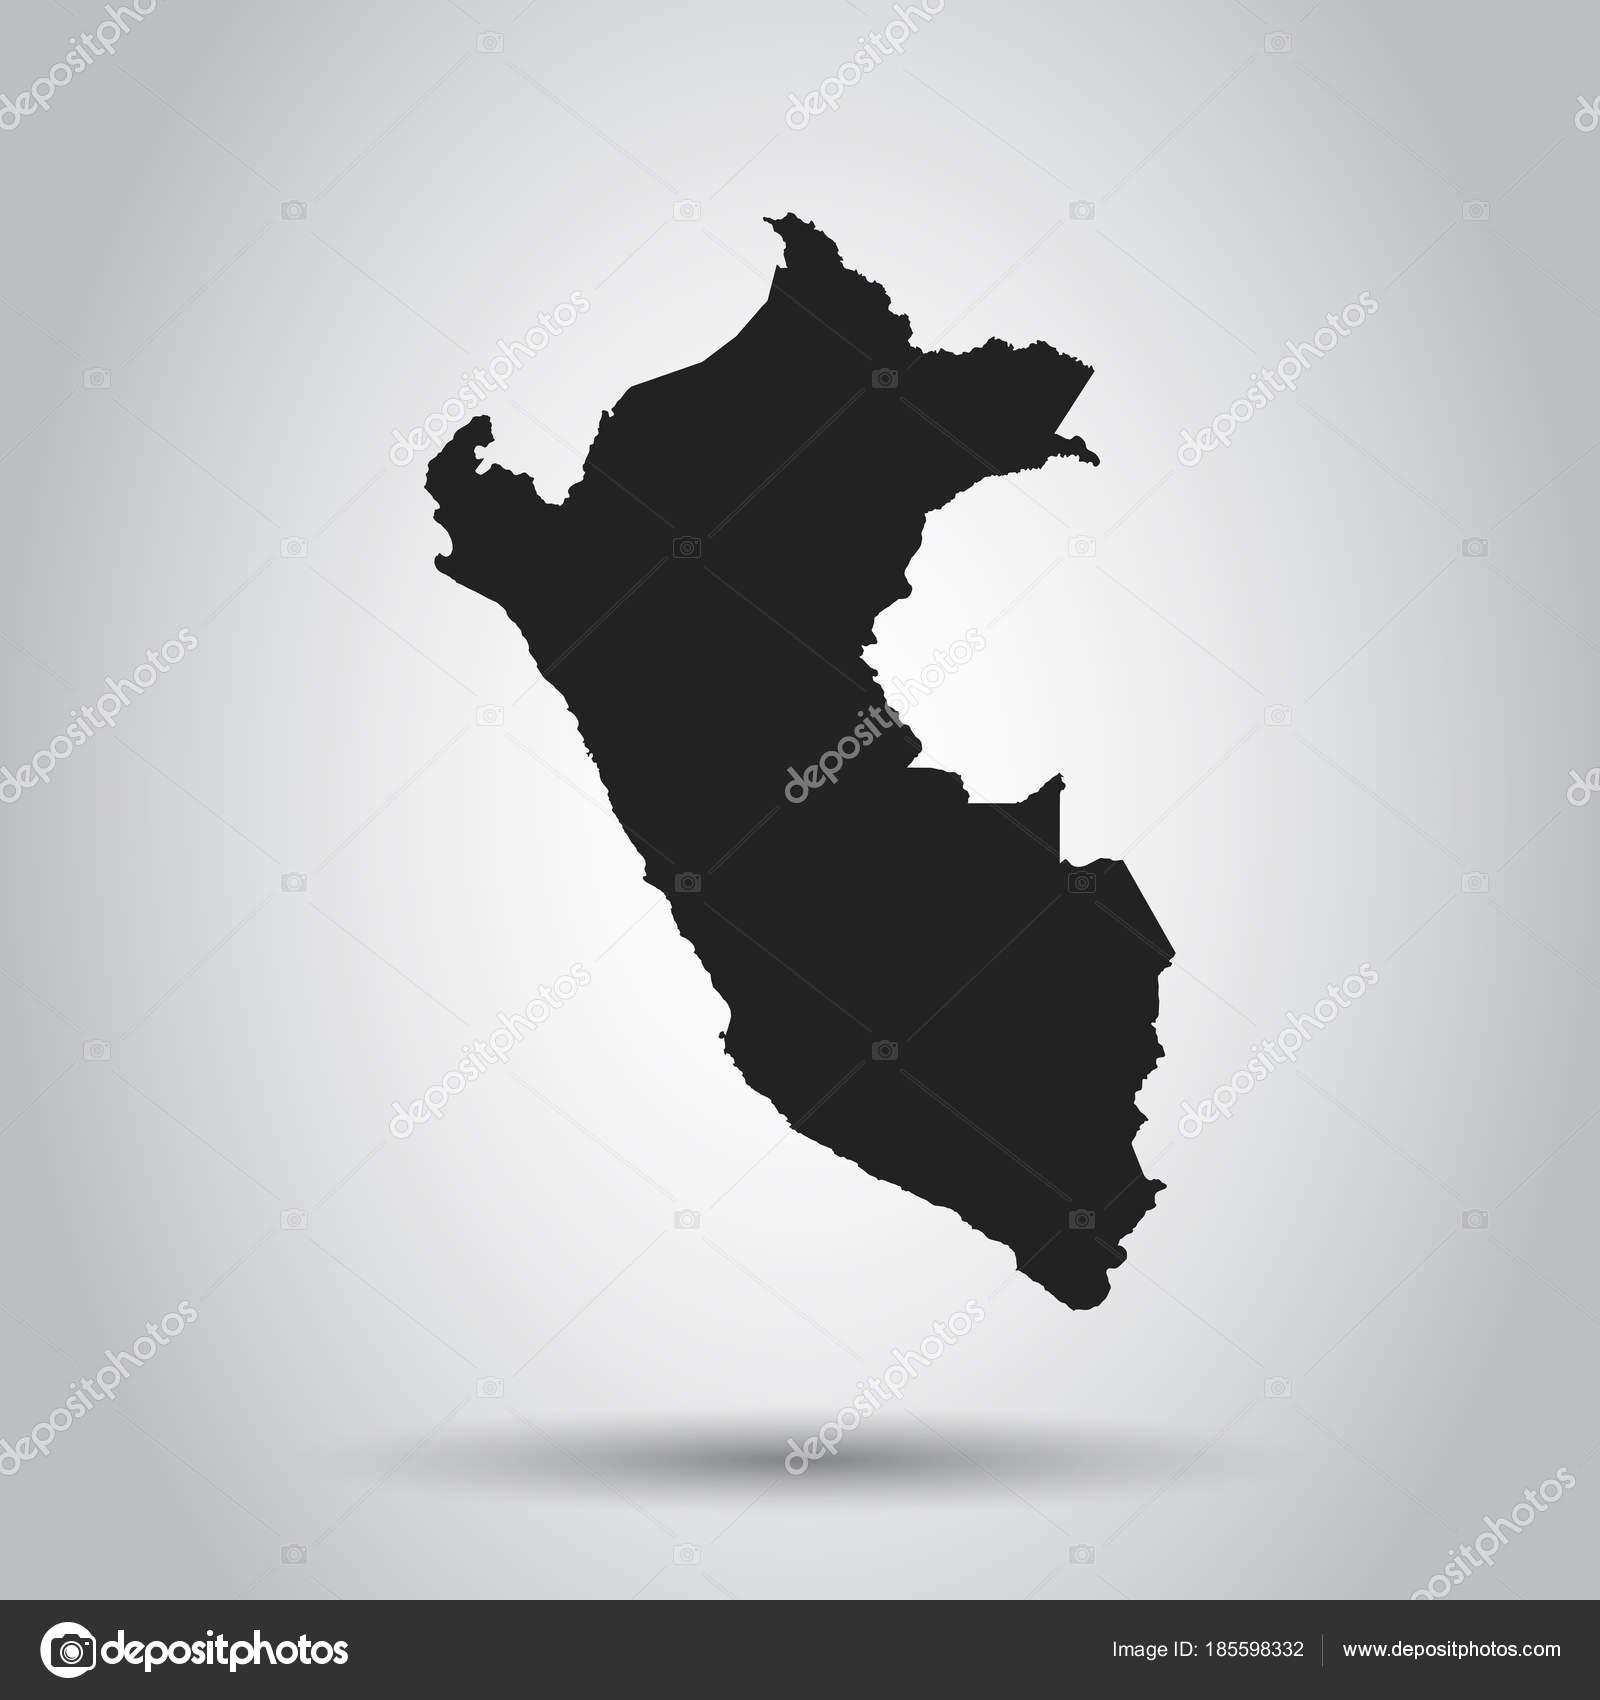 Peru vector map black icon on white background stock vector peru vector map black icon on white background stock vector gumiabroncs Image collections